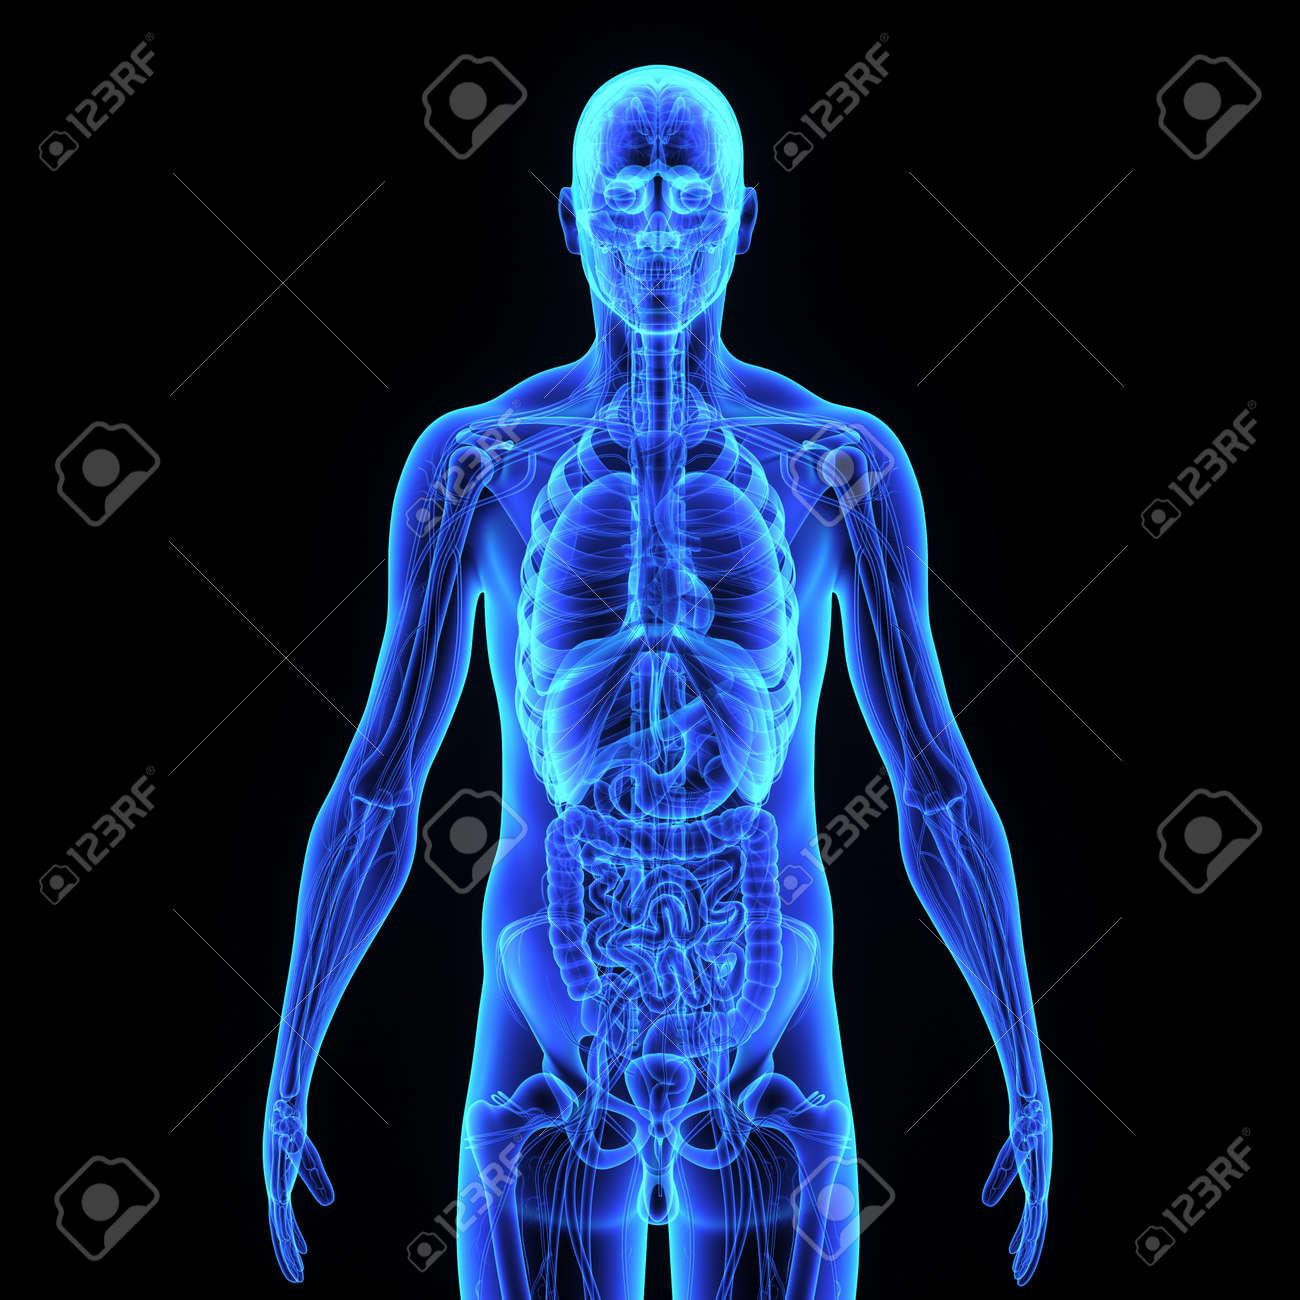 Human Anatomy Stock Photo - 33430566